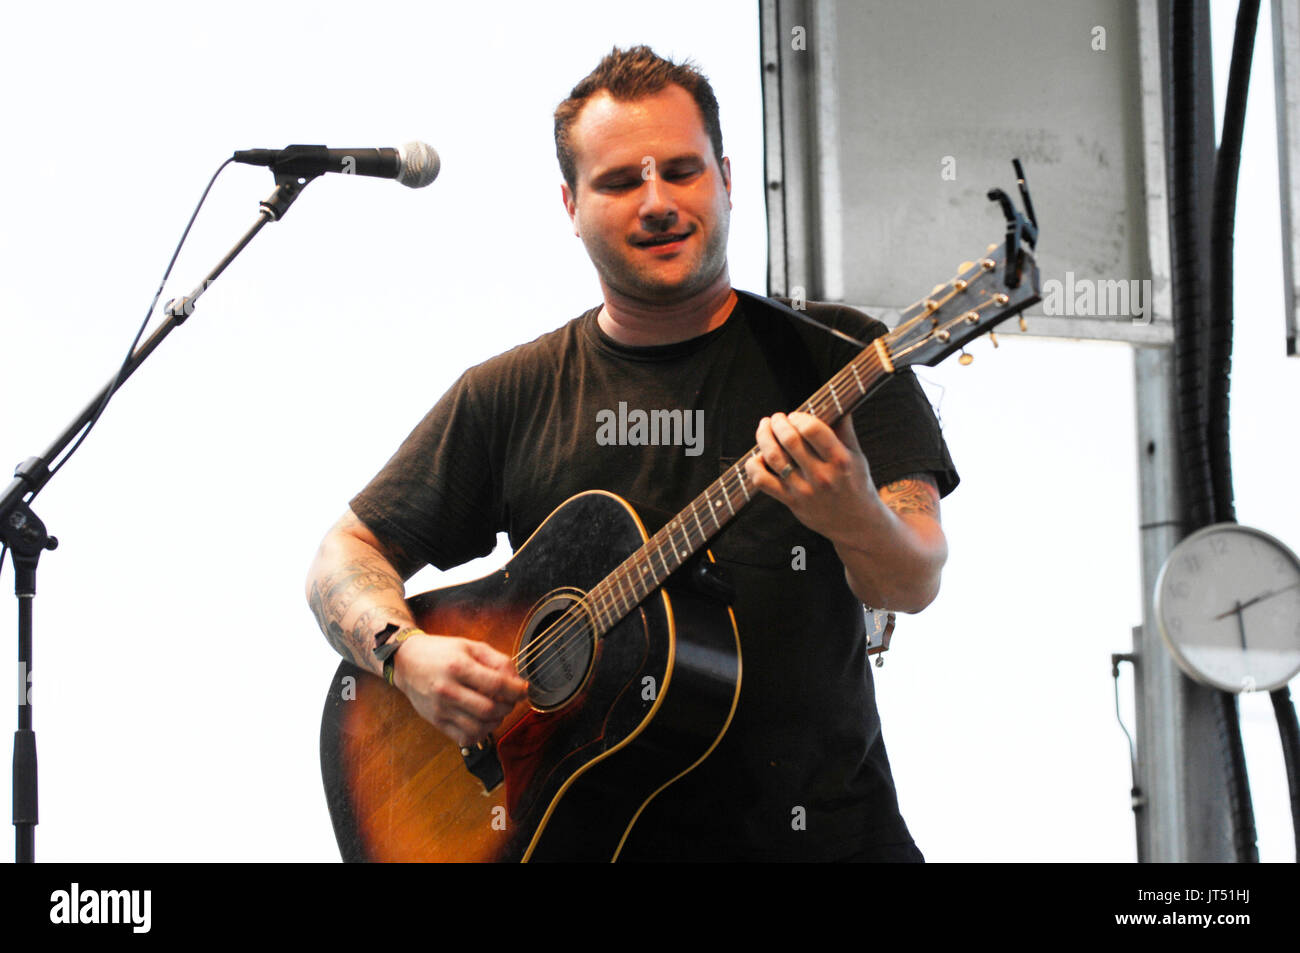 Matt Pryor Terrible Two's performing 2008 Lollapalooza Music Festival Grant Park Chicago. - Stock Image